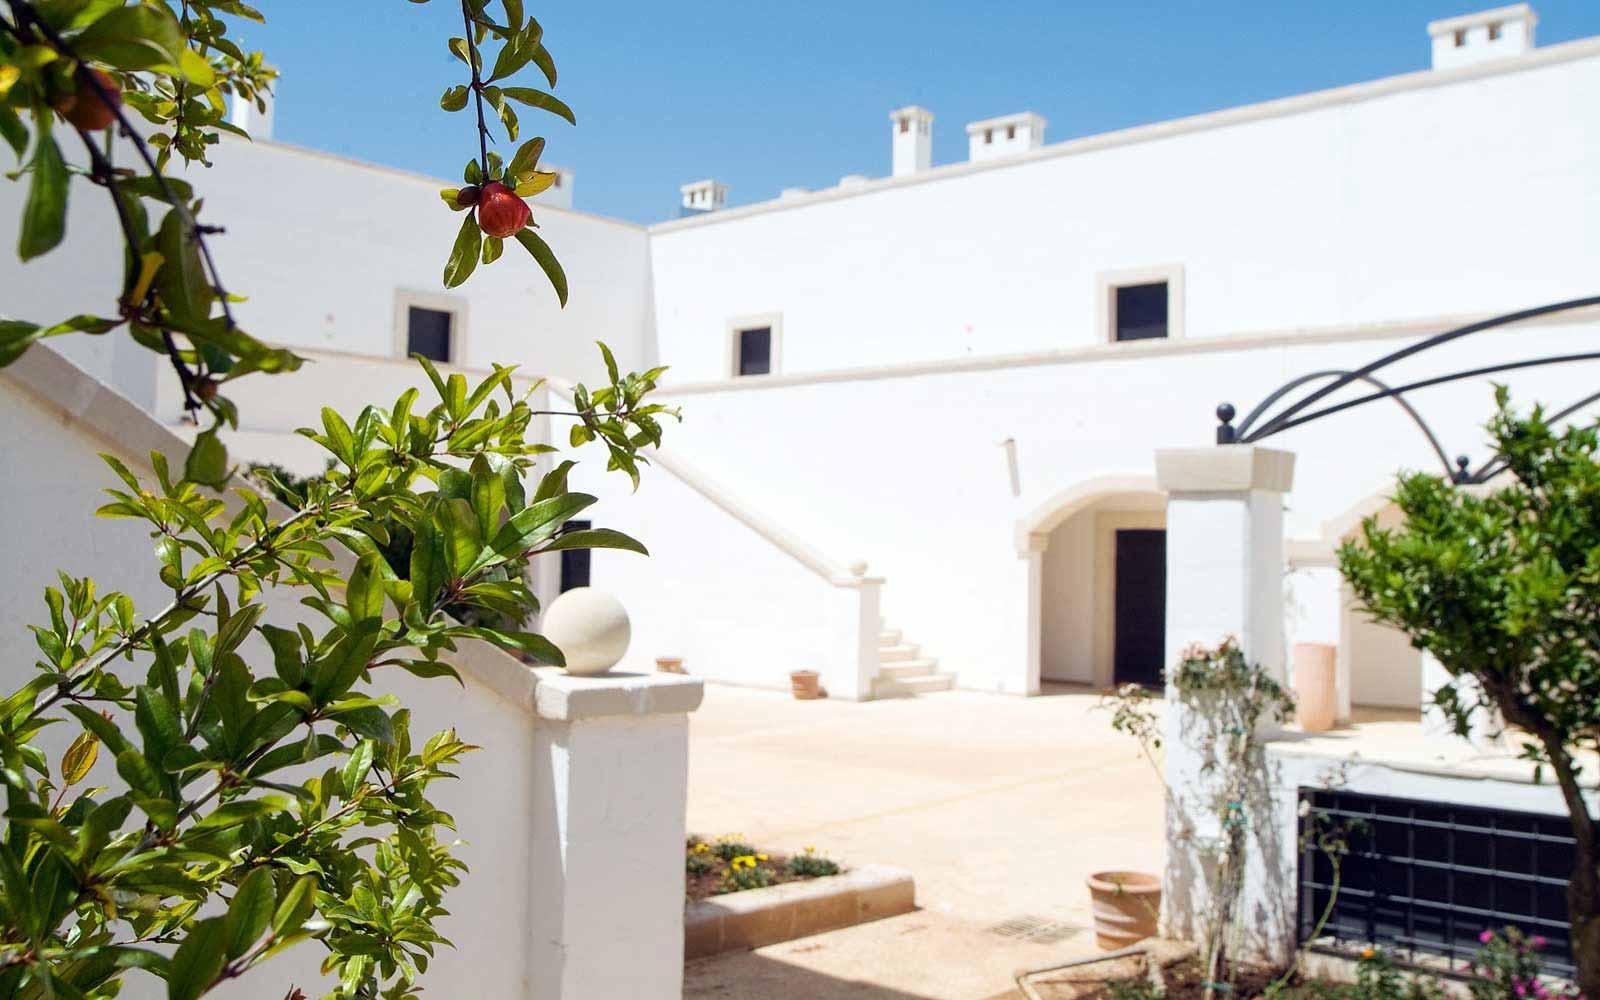 Apulian Masseria style at Borgobianco Resort & Spa